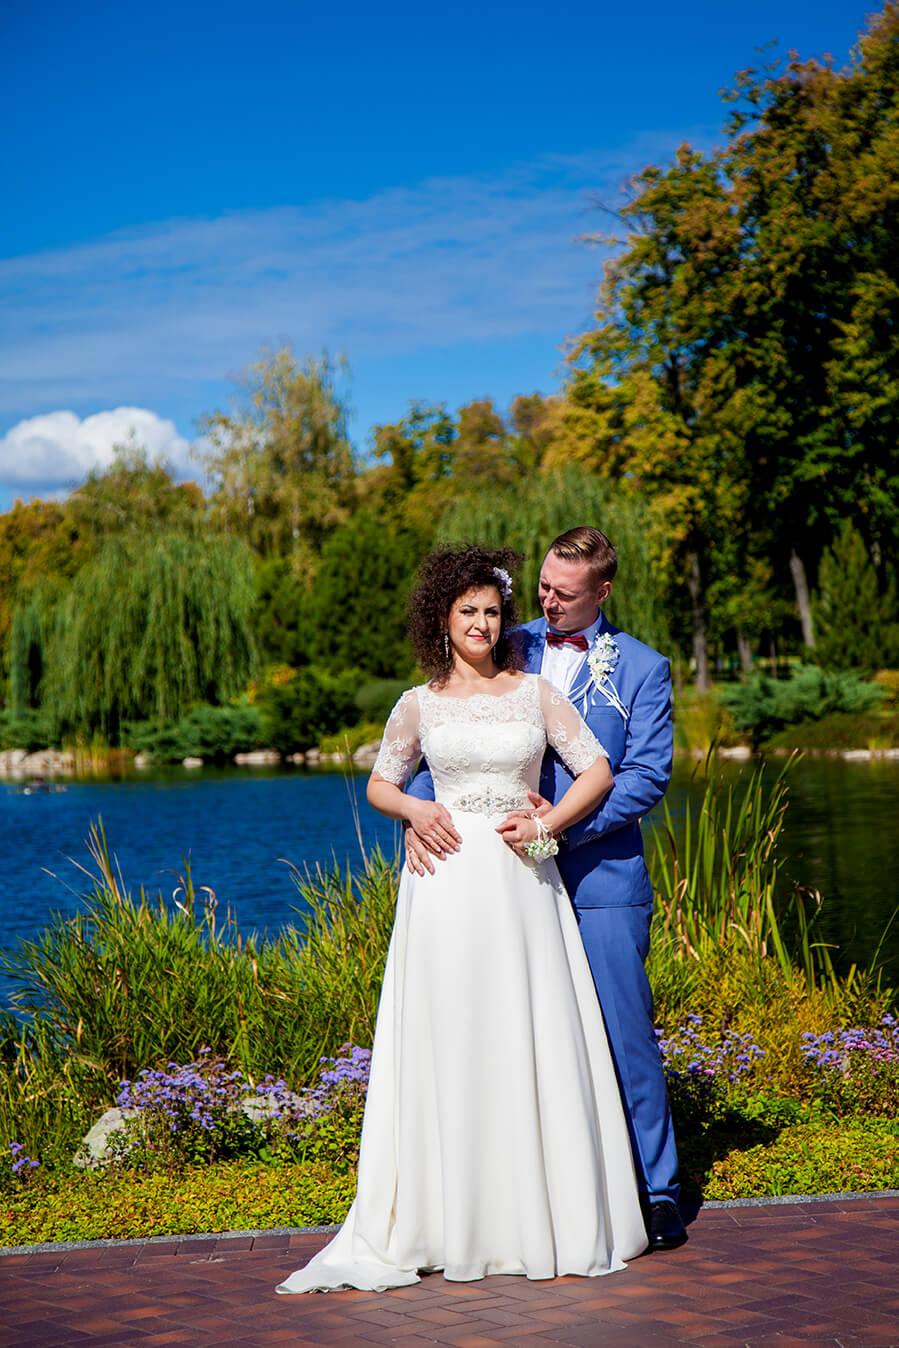 3-svadebnyj-fotograf-videooperator-svadebnoe-foto-idei-kiev-28